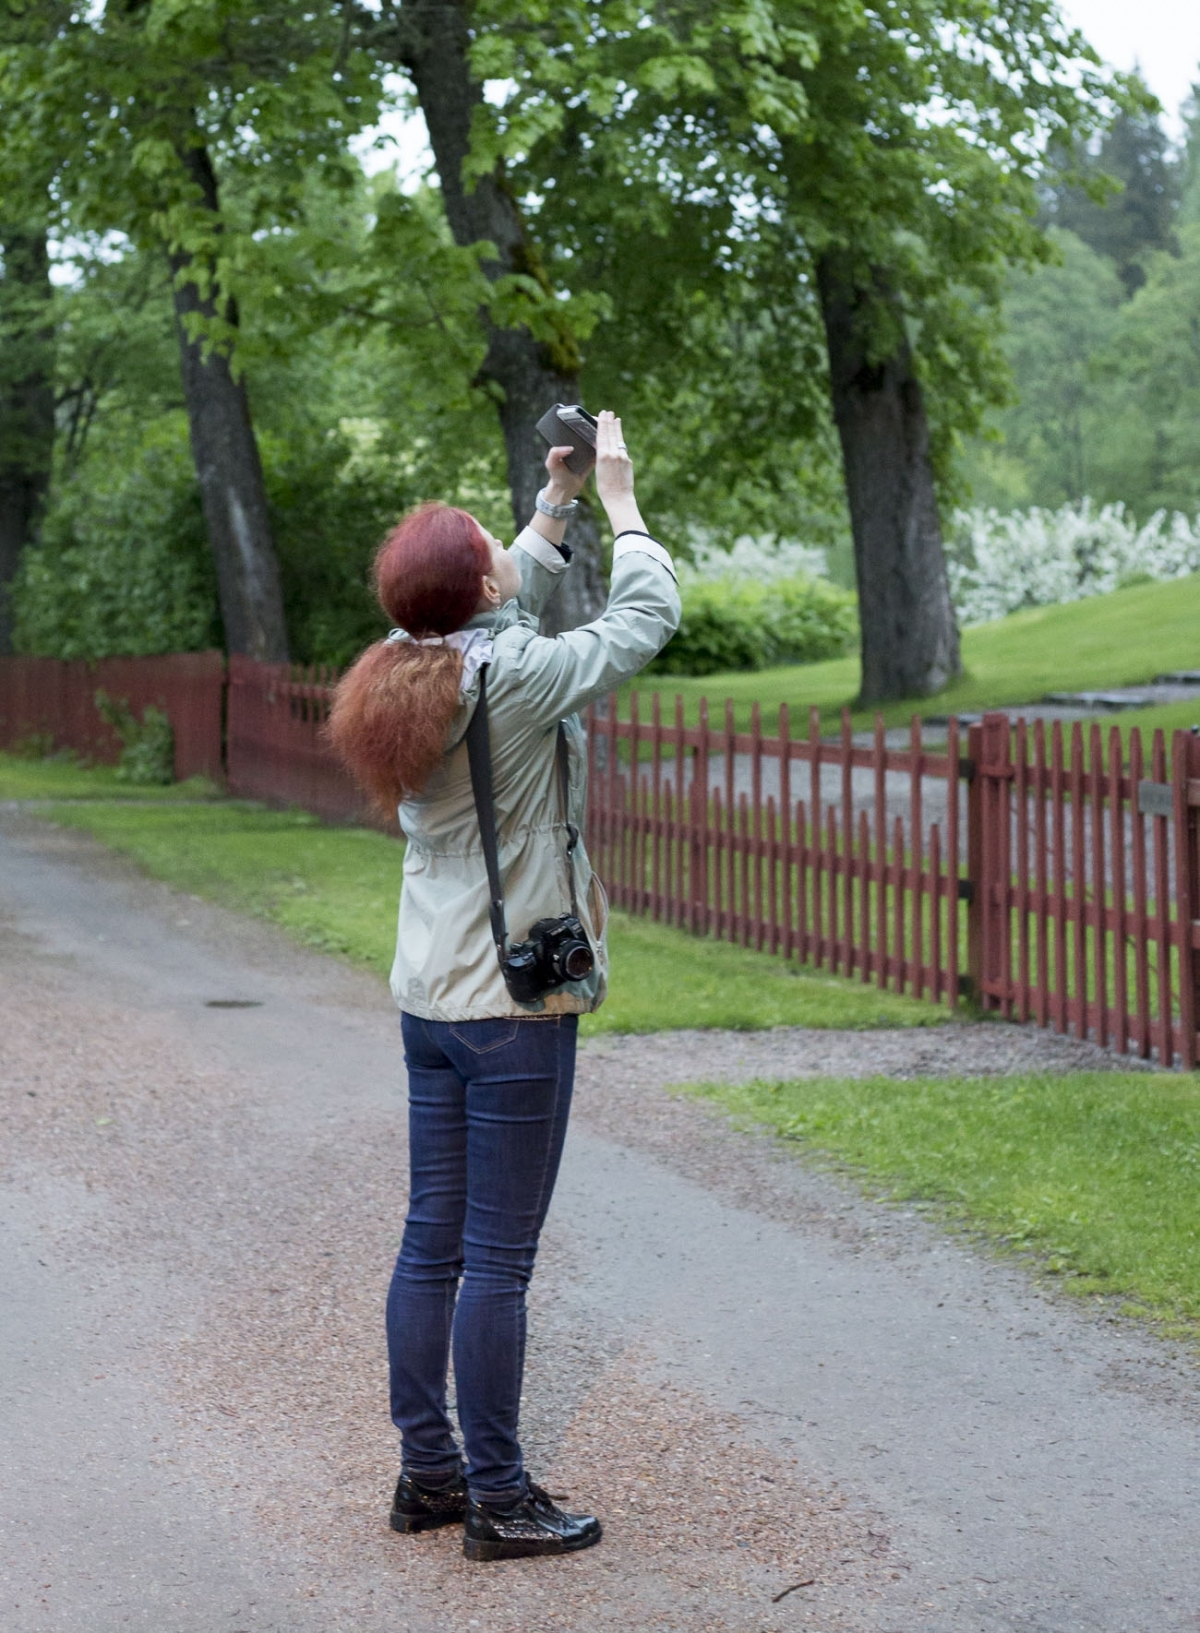 fotografer-9743